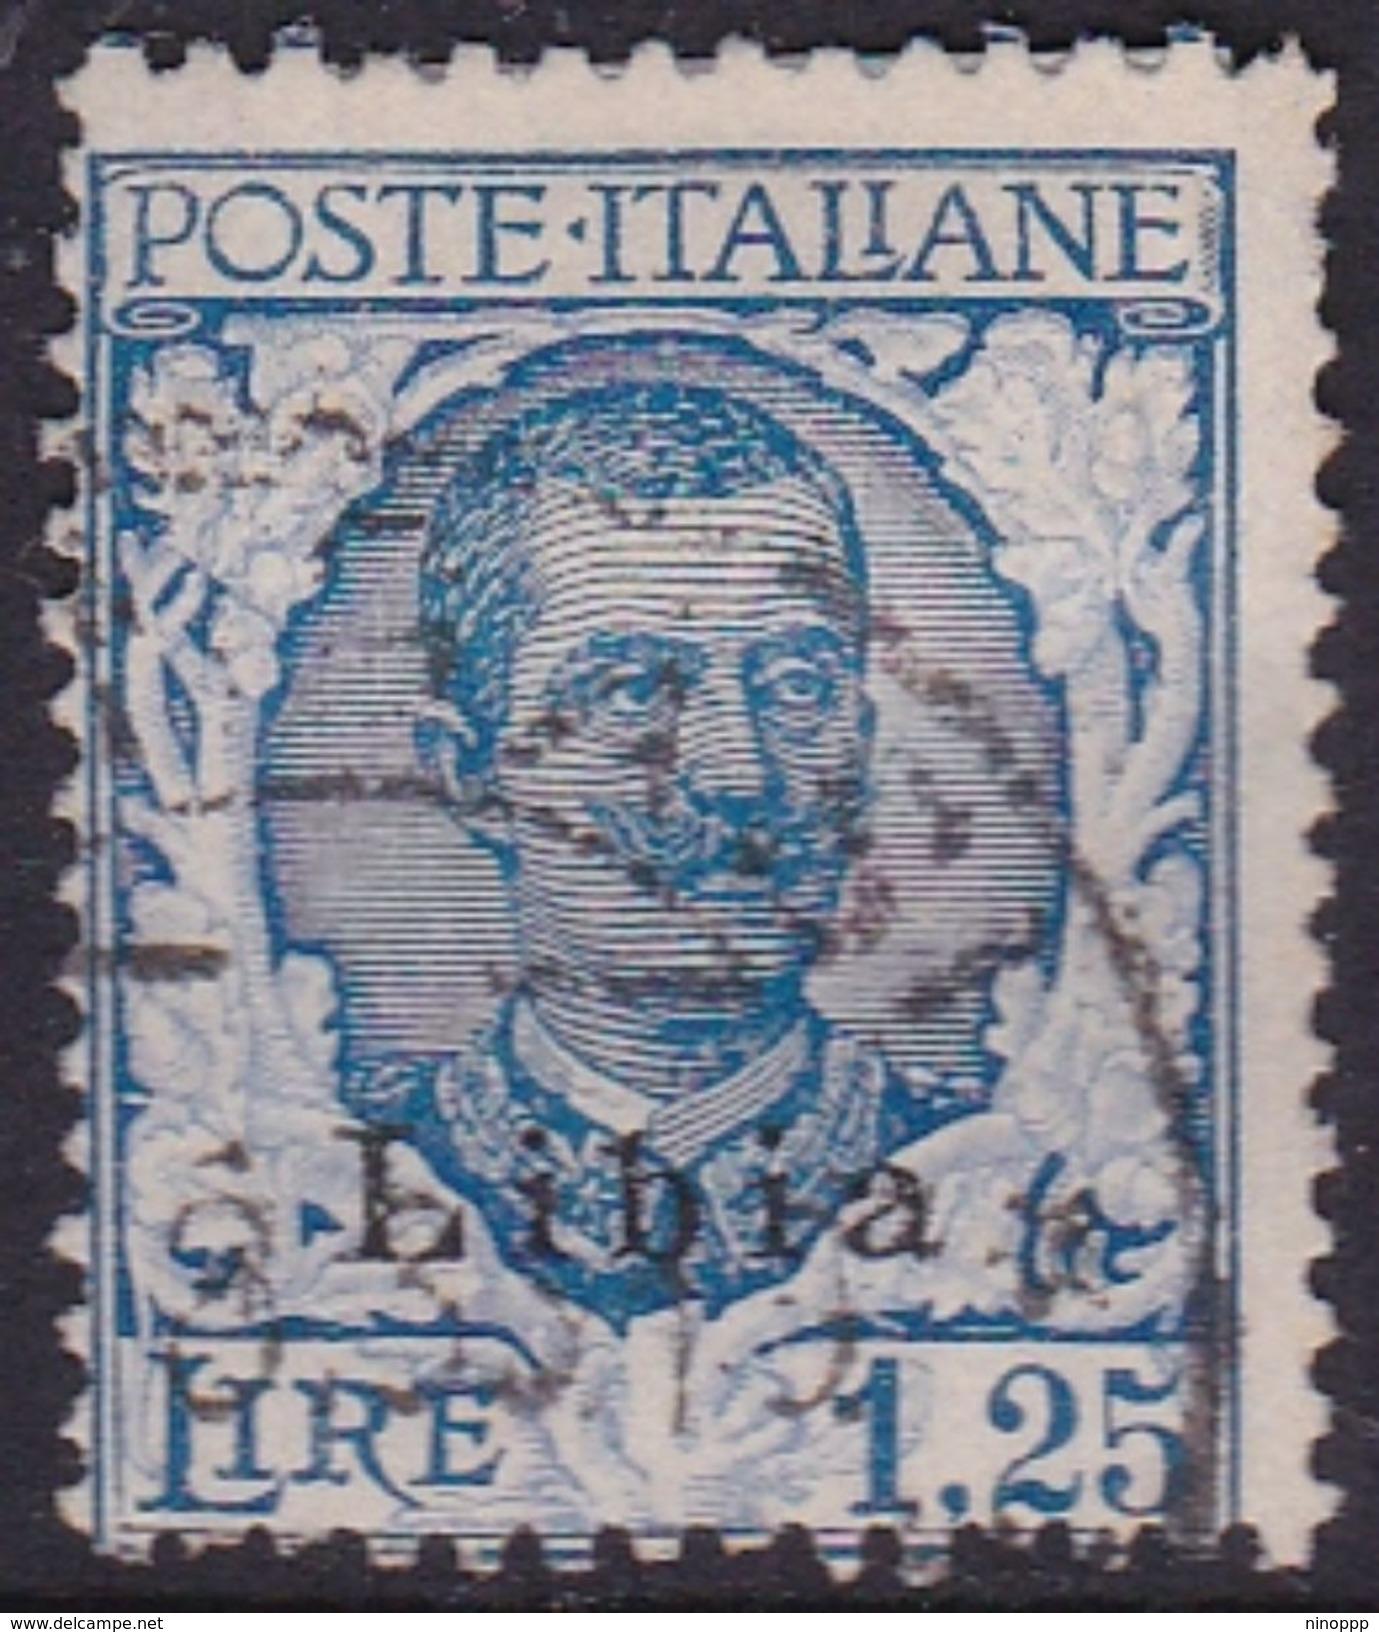 Italy-Colonies And Territories-Libya S 79 1929 King  V. Emanuele III, 1,25 Lira Blue,used - Libya